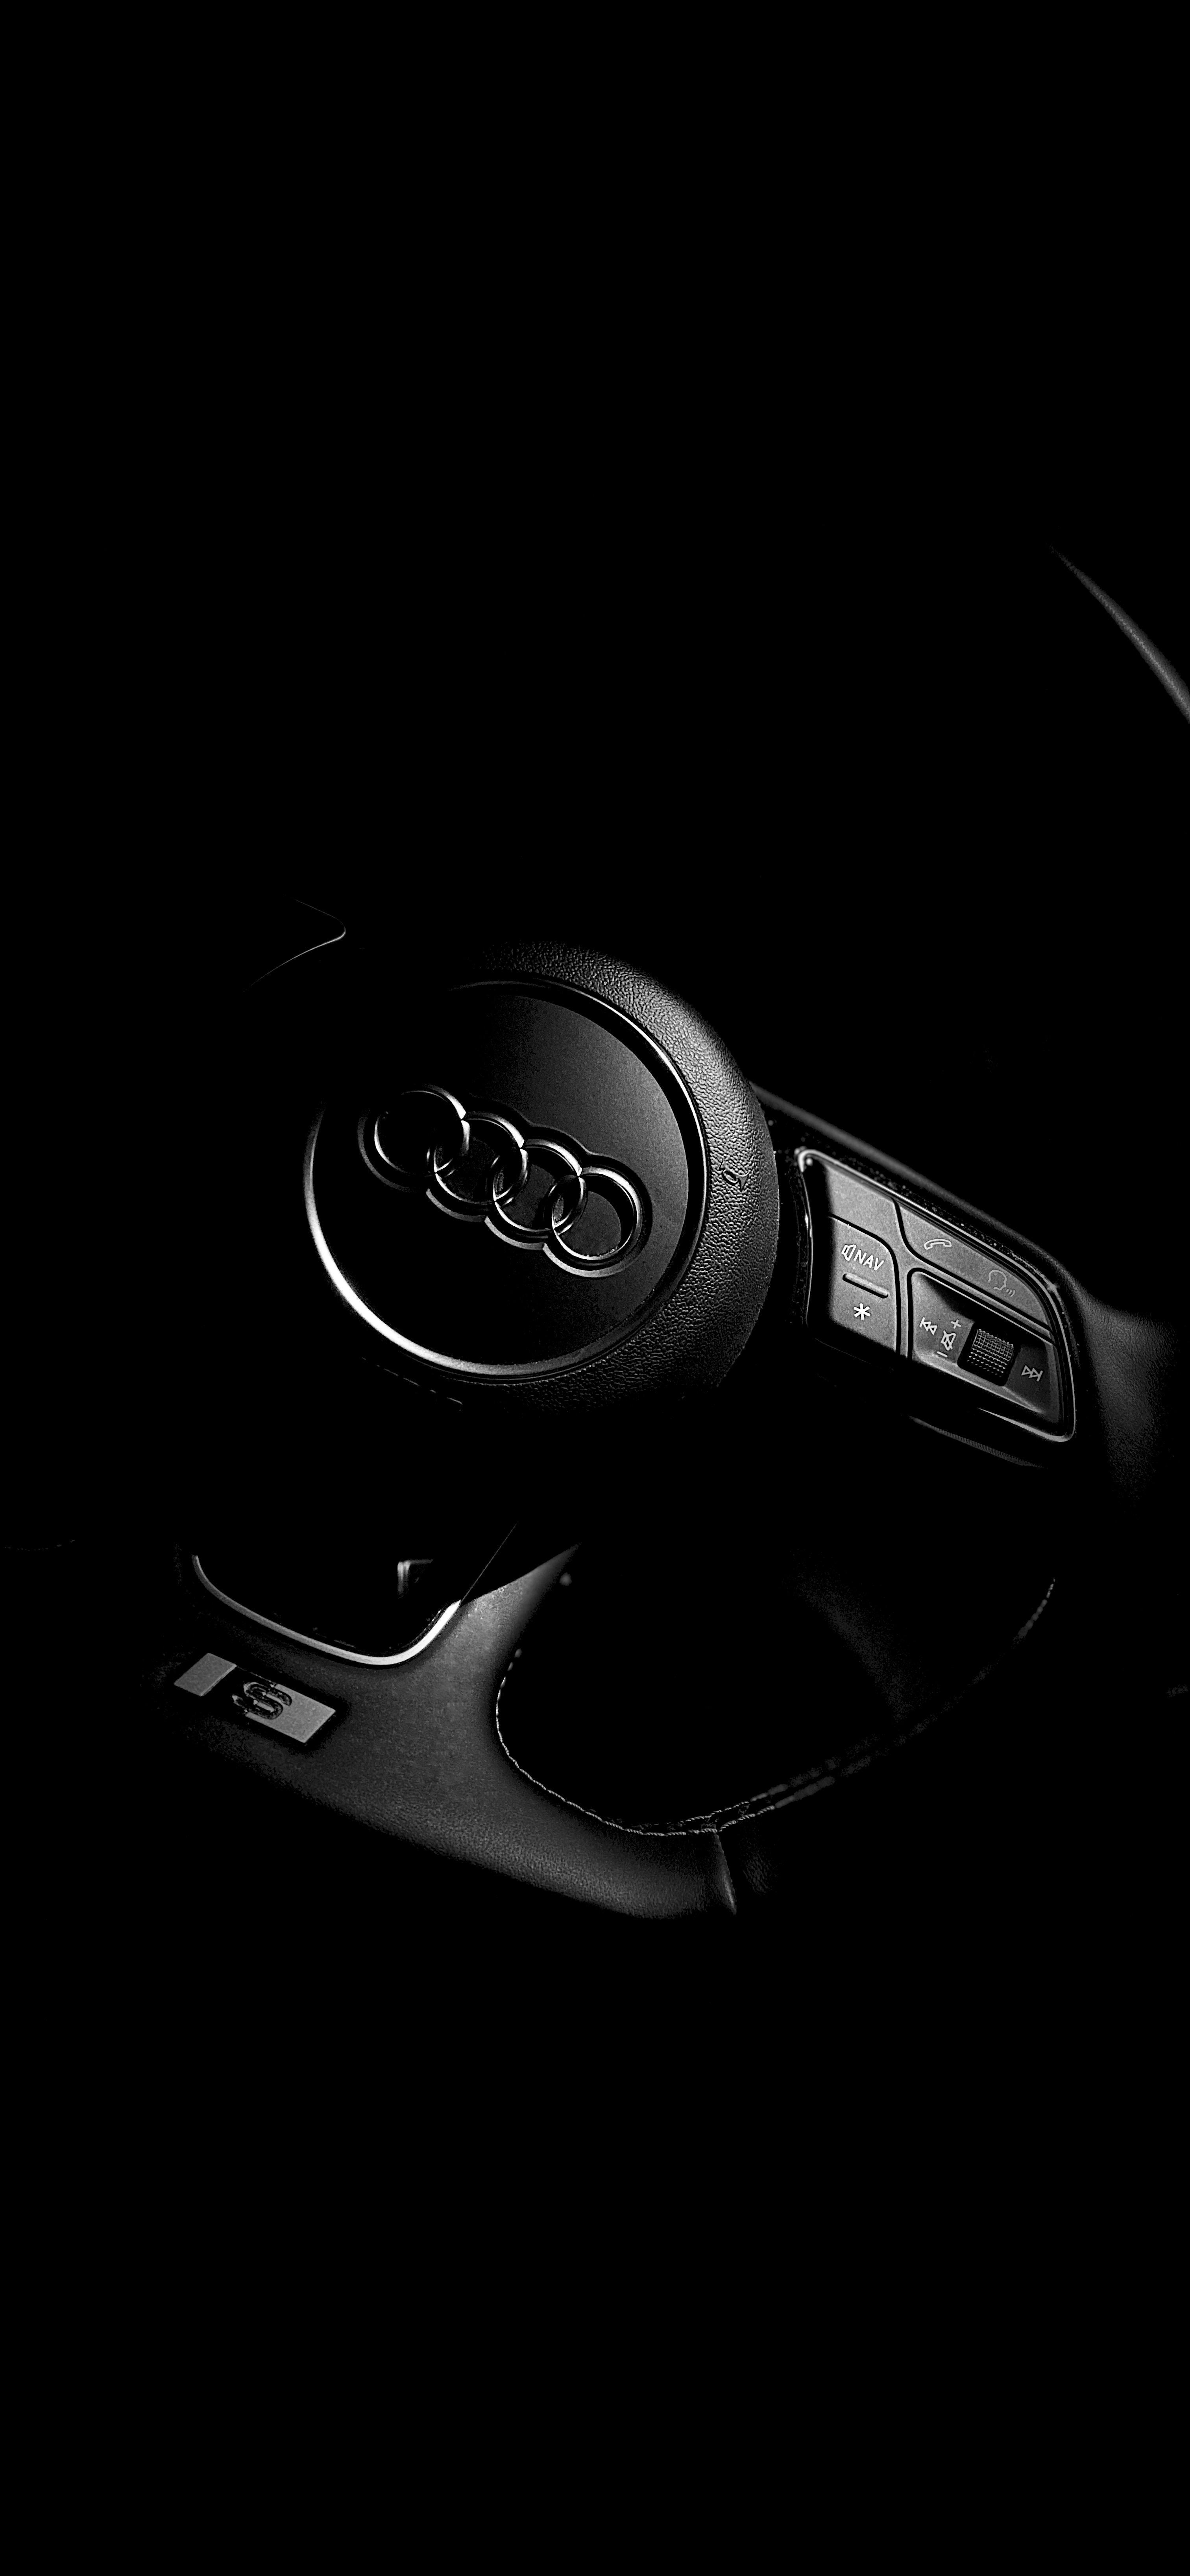 Audi Logo Iphone Wallpapers Top Free Audi Logo Iphone Backgrounds Wallpaperaccess